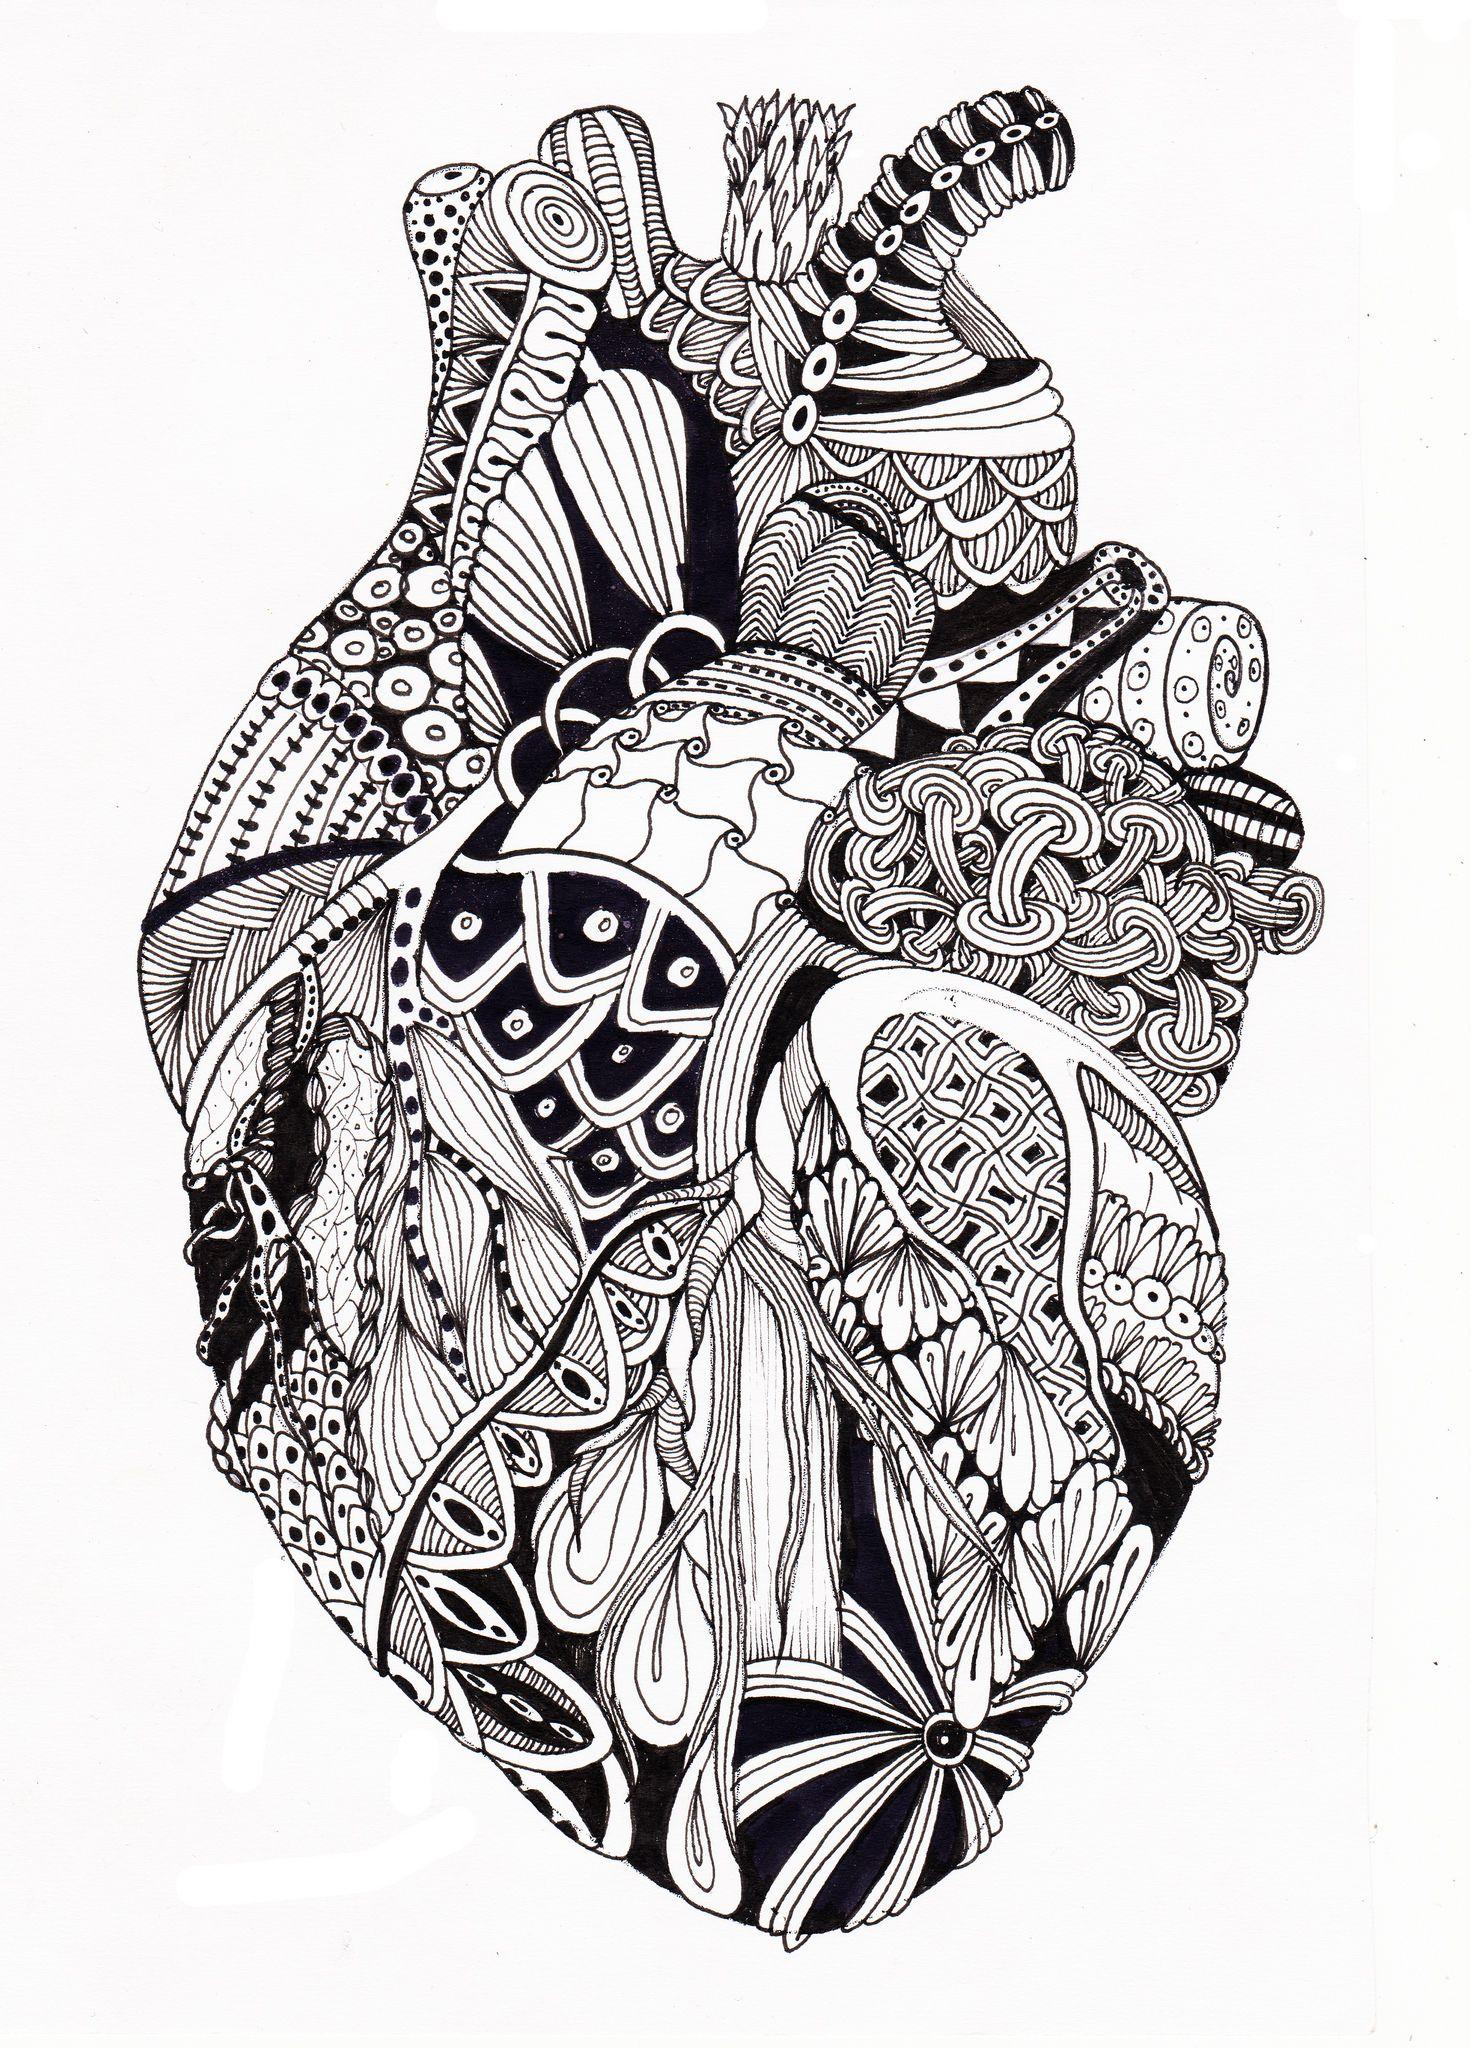 Zenheart1 Creative Art Heart Art Y Anatomical Heart